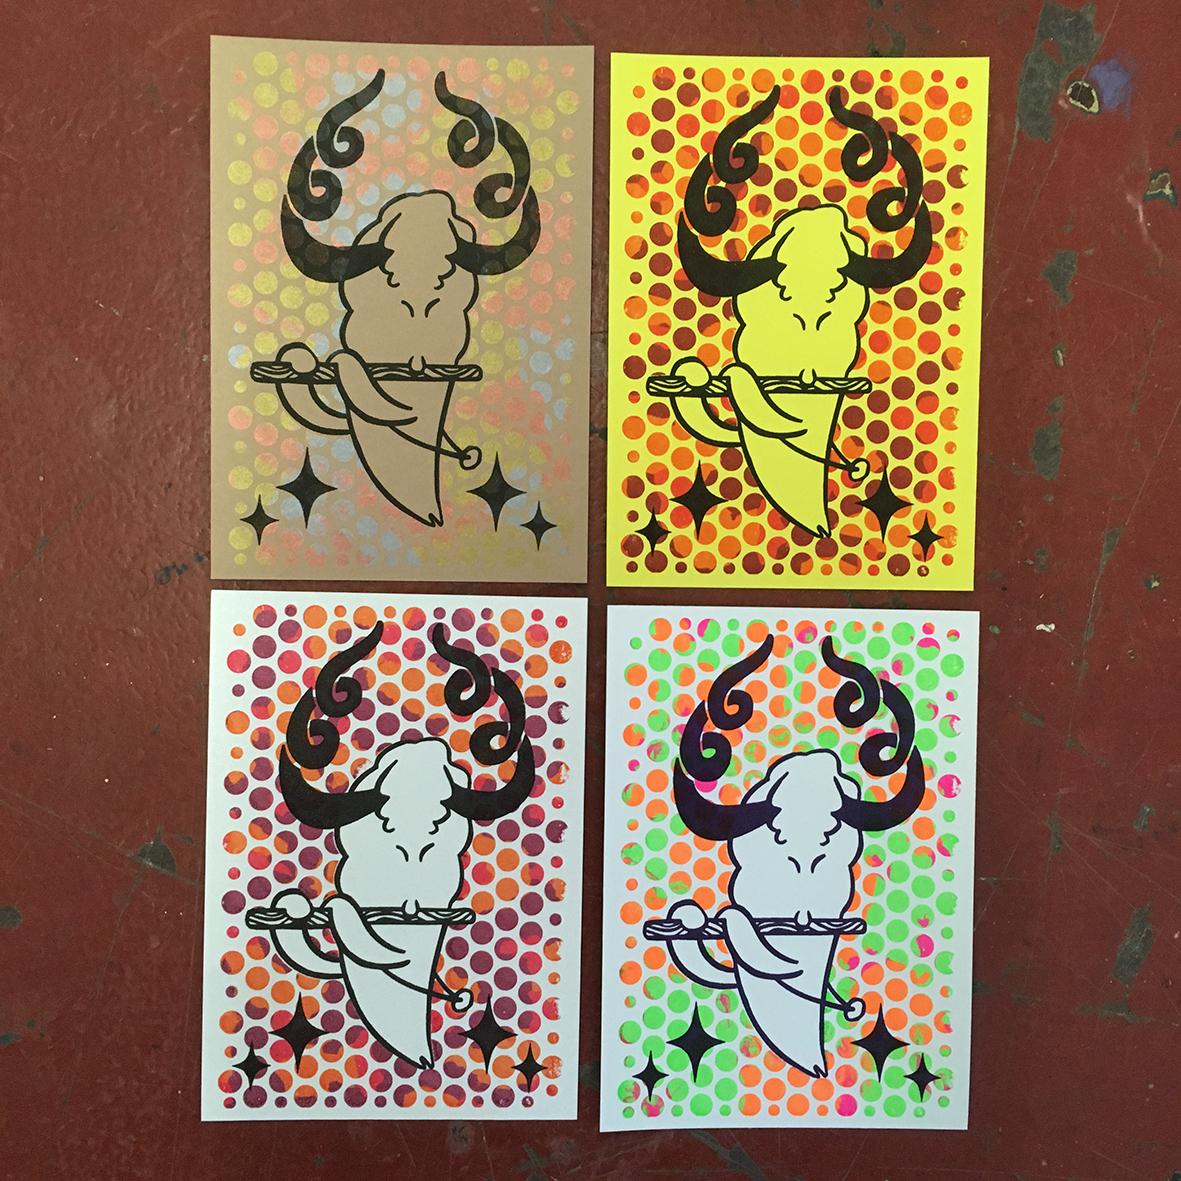 Gocco postcard 4 pack